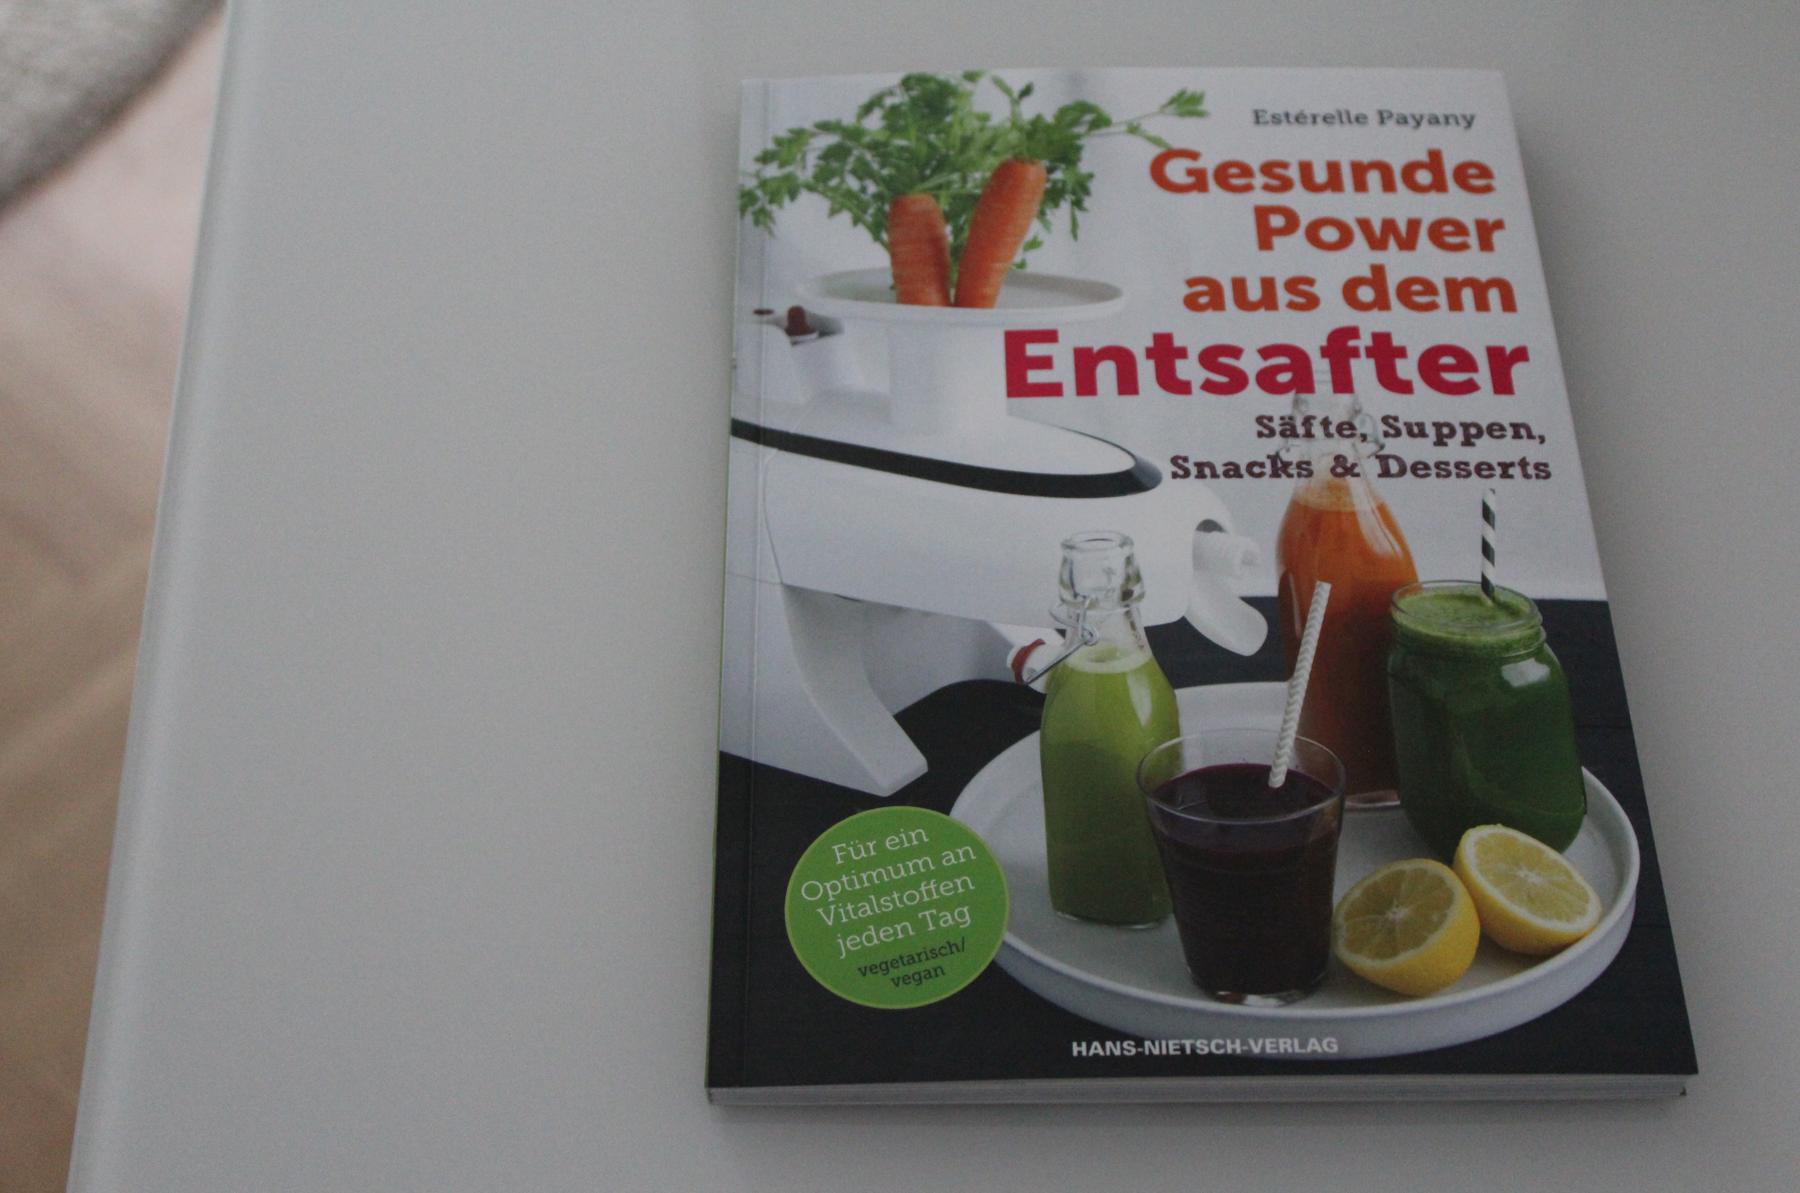 16 Gesunde Power aus dem Entsafter Buch Entsaften Juicing Säfte Snacks Desserts